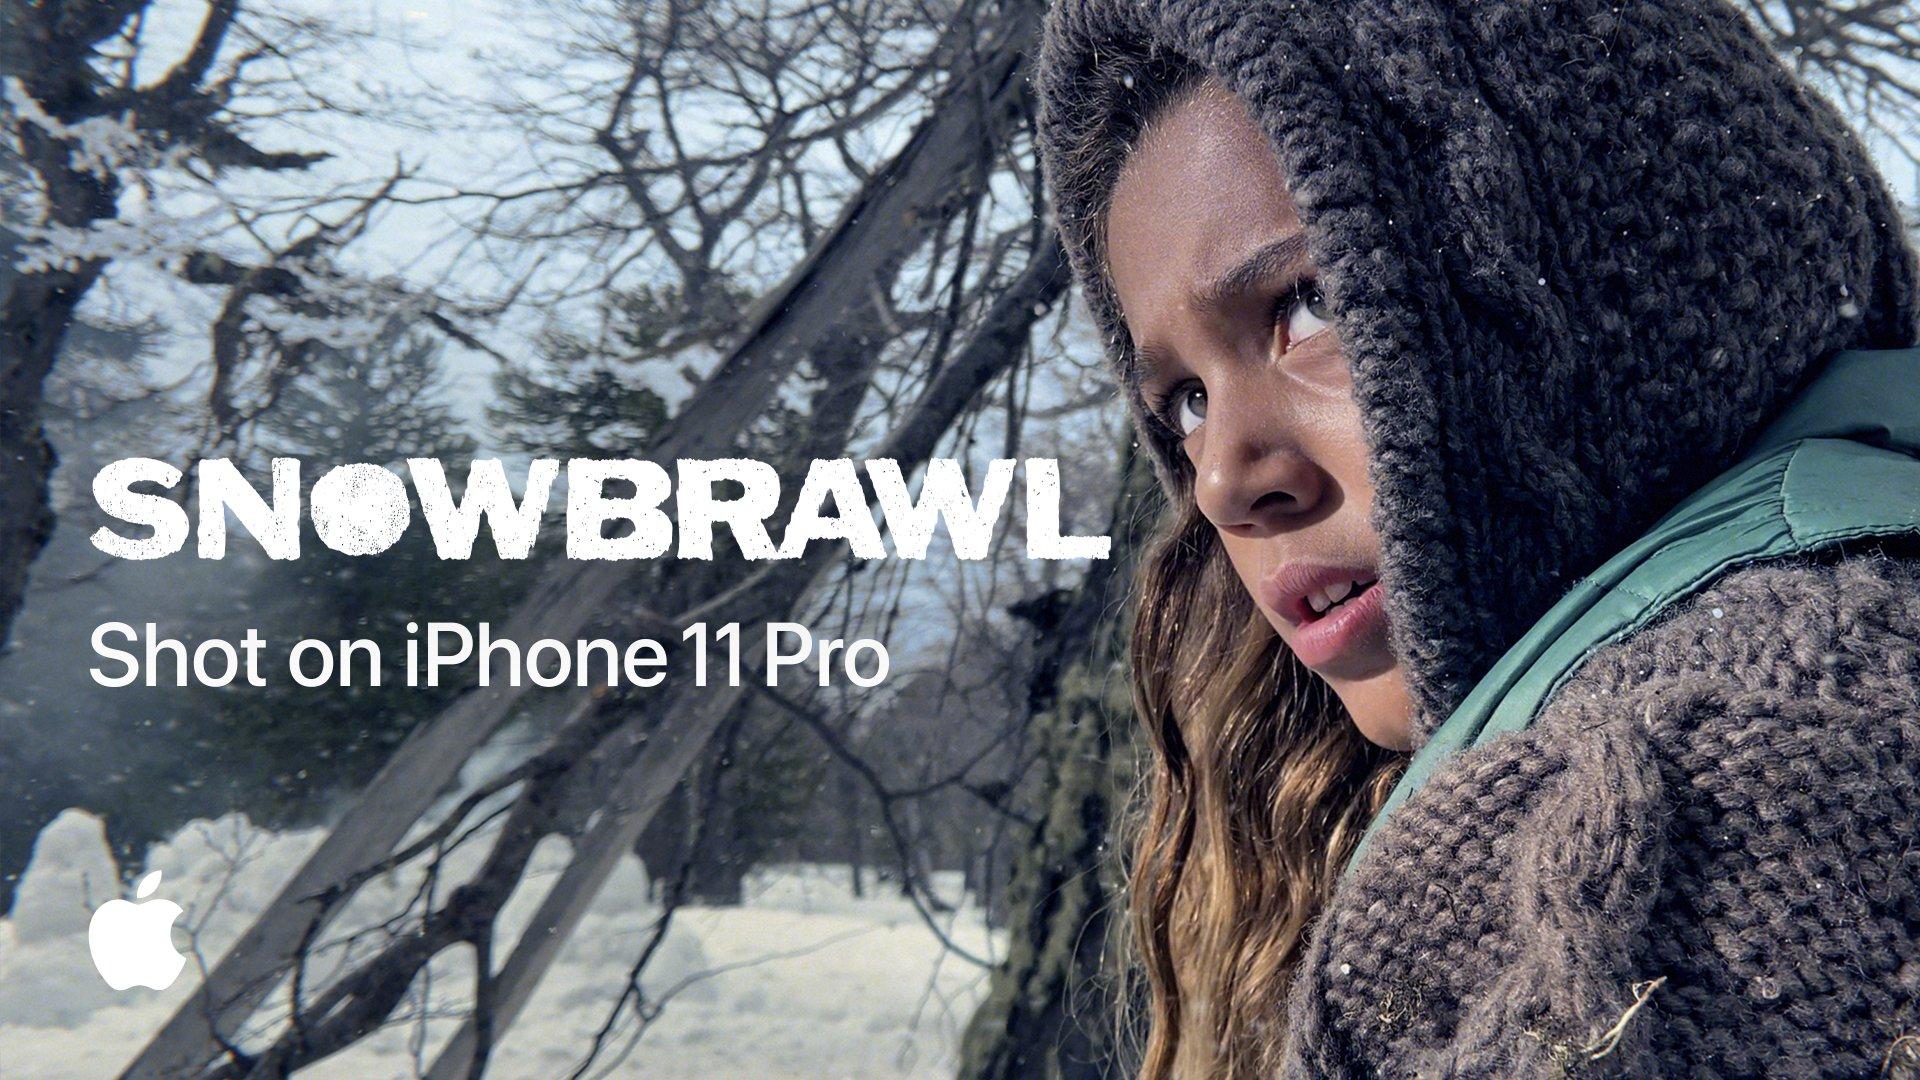 Thumbnail for Shot on iPhone 11 Pro—Snowbrawl